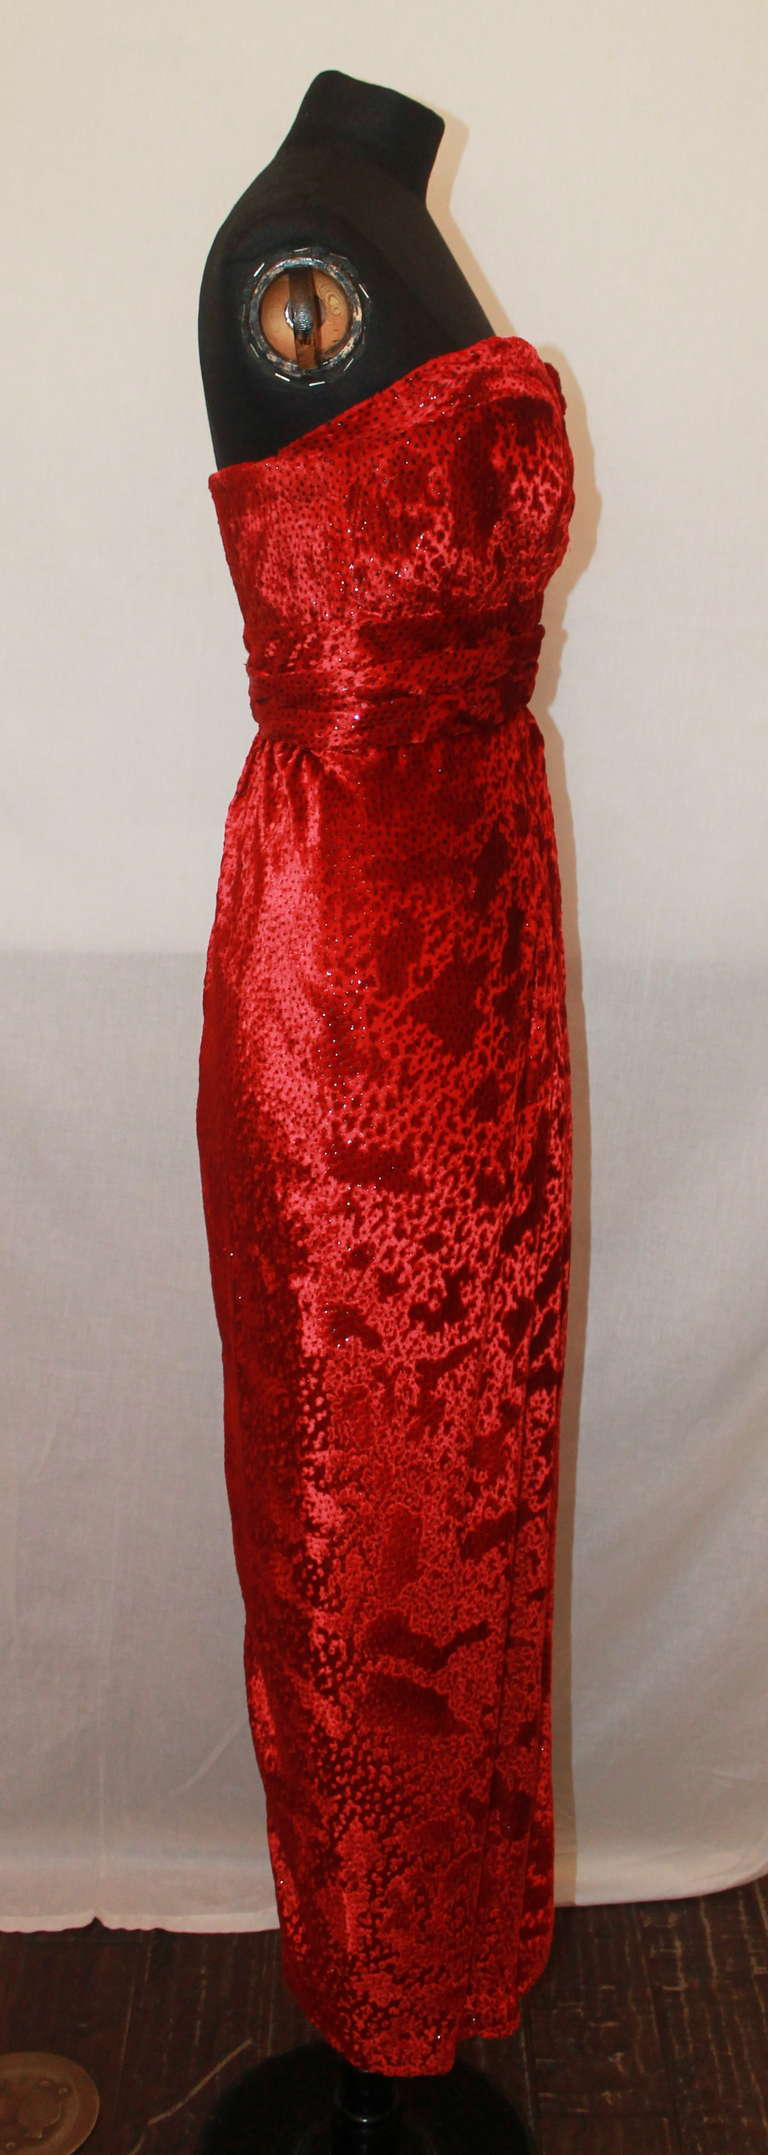 Carolyn Roehm Red Silk Pane Velvet Gown - 4 3